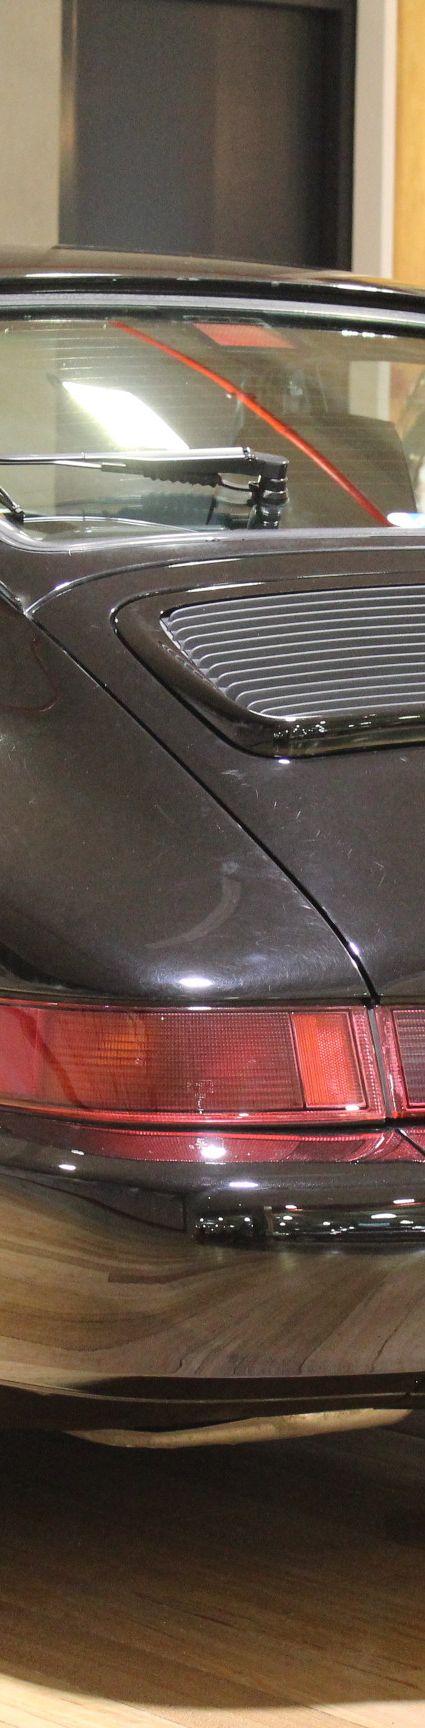 1990 Porsche 911/964 Carrera 4